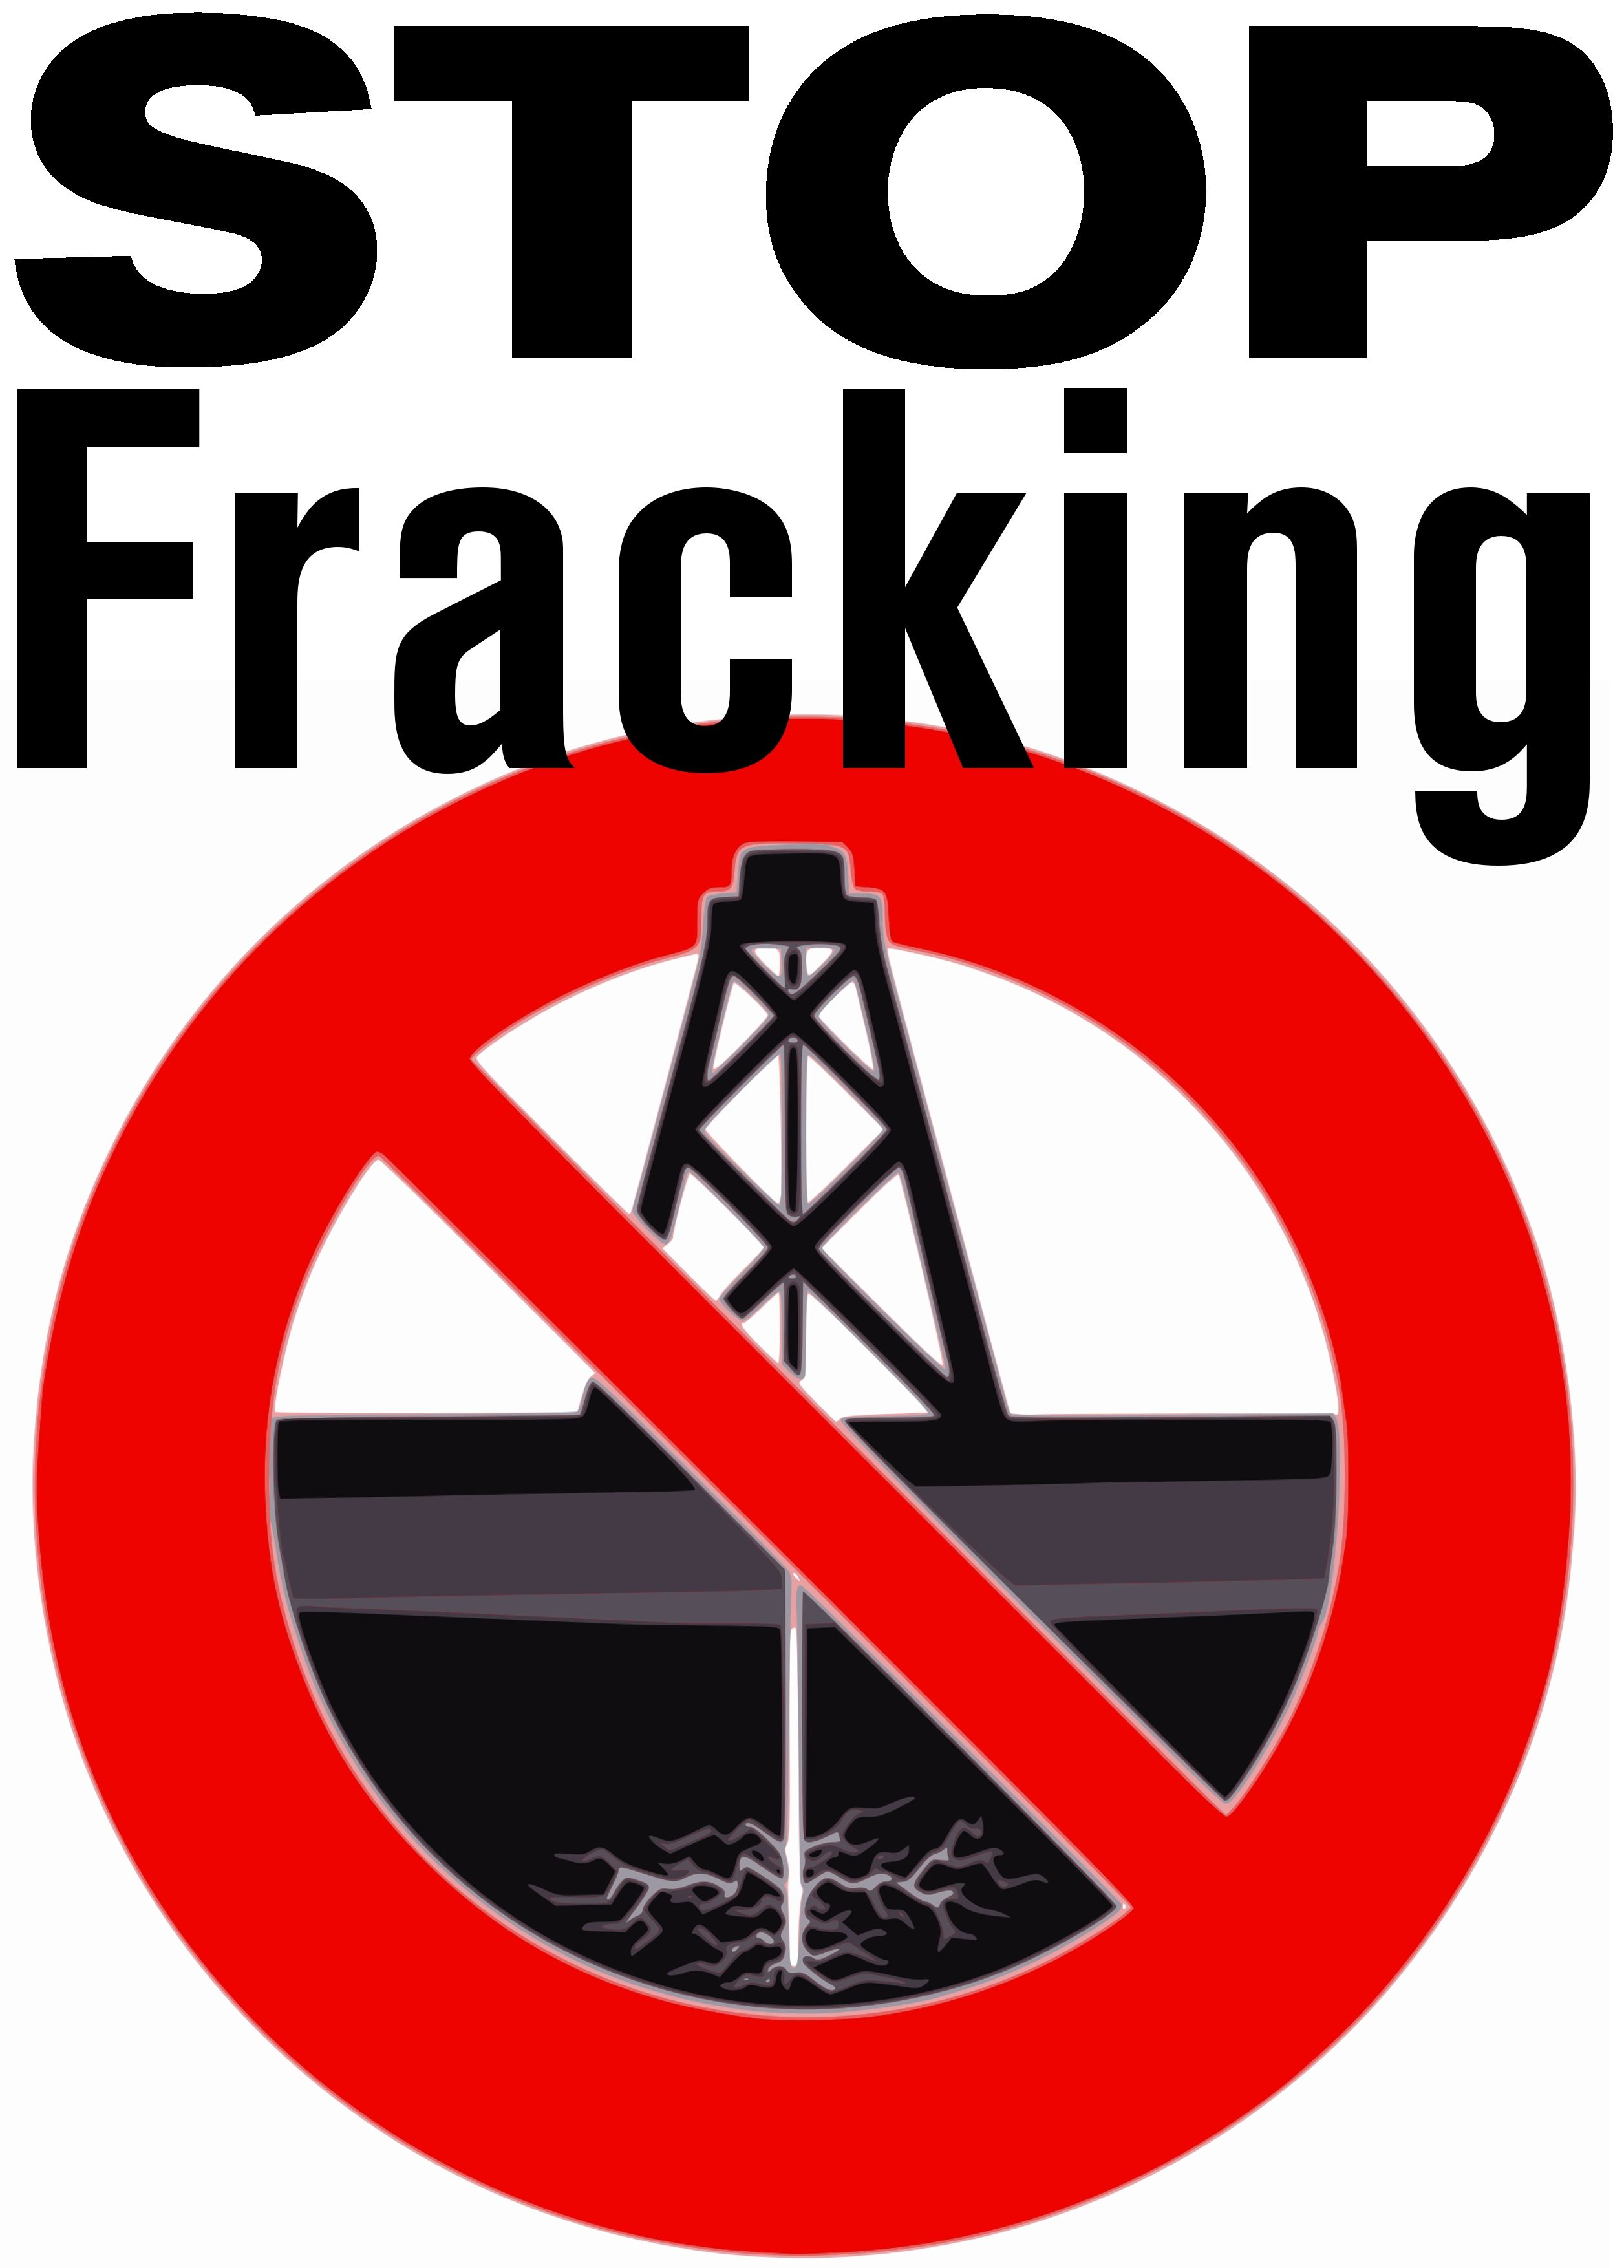 http://crown.kings.edu/wp-content/uploads/2013/09/stop-fracking.jpg